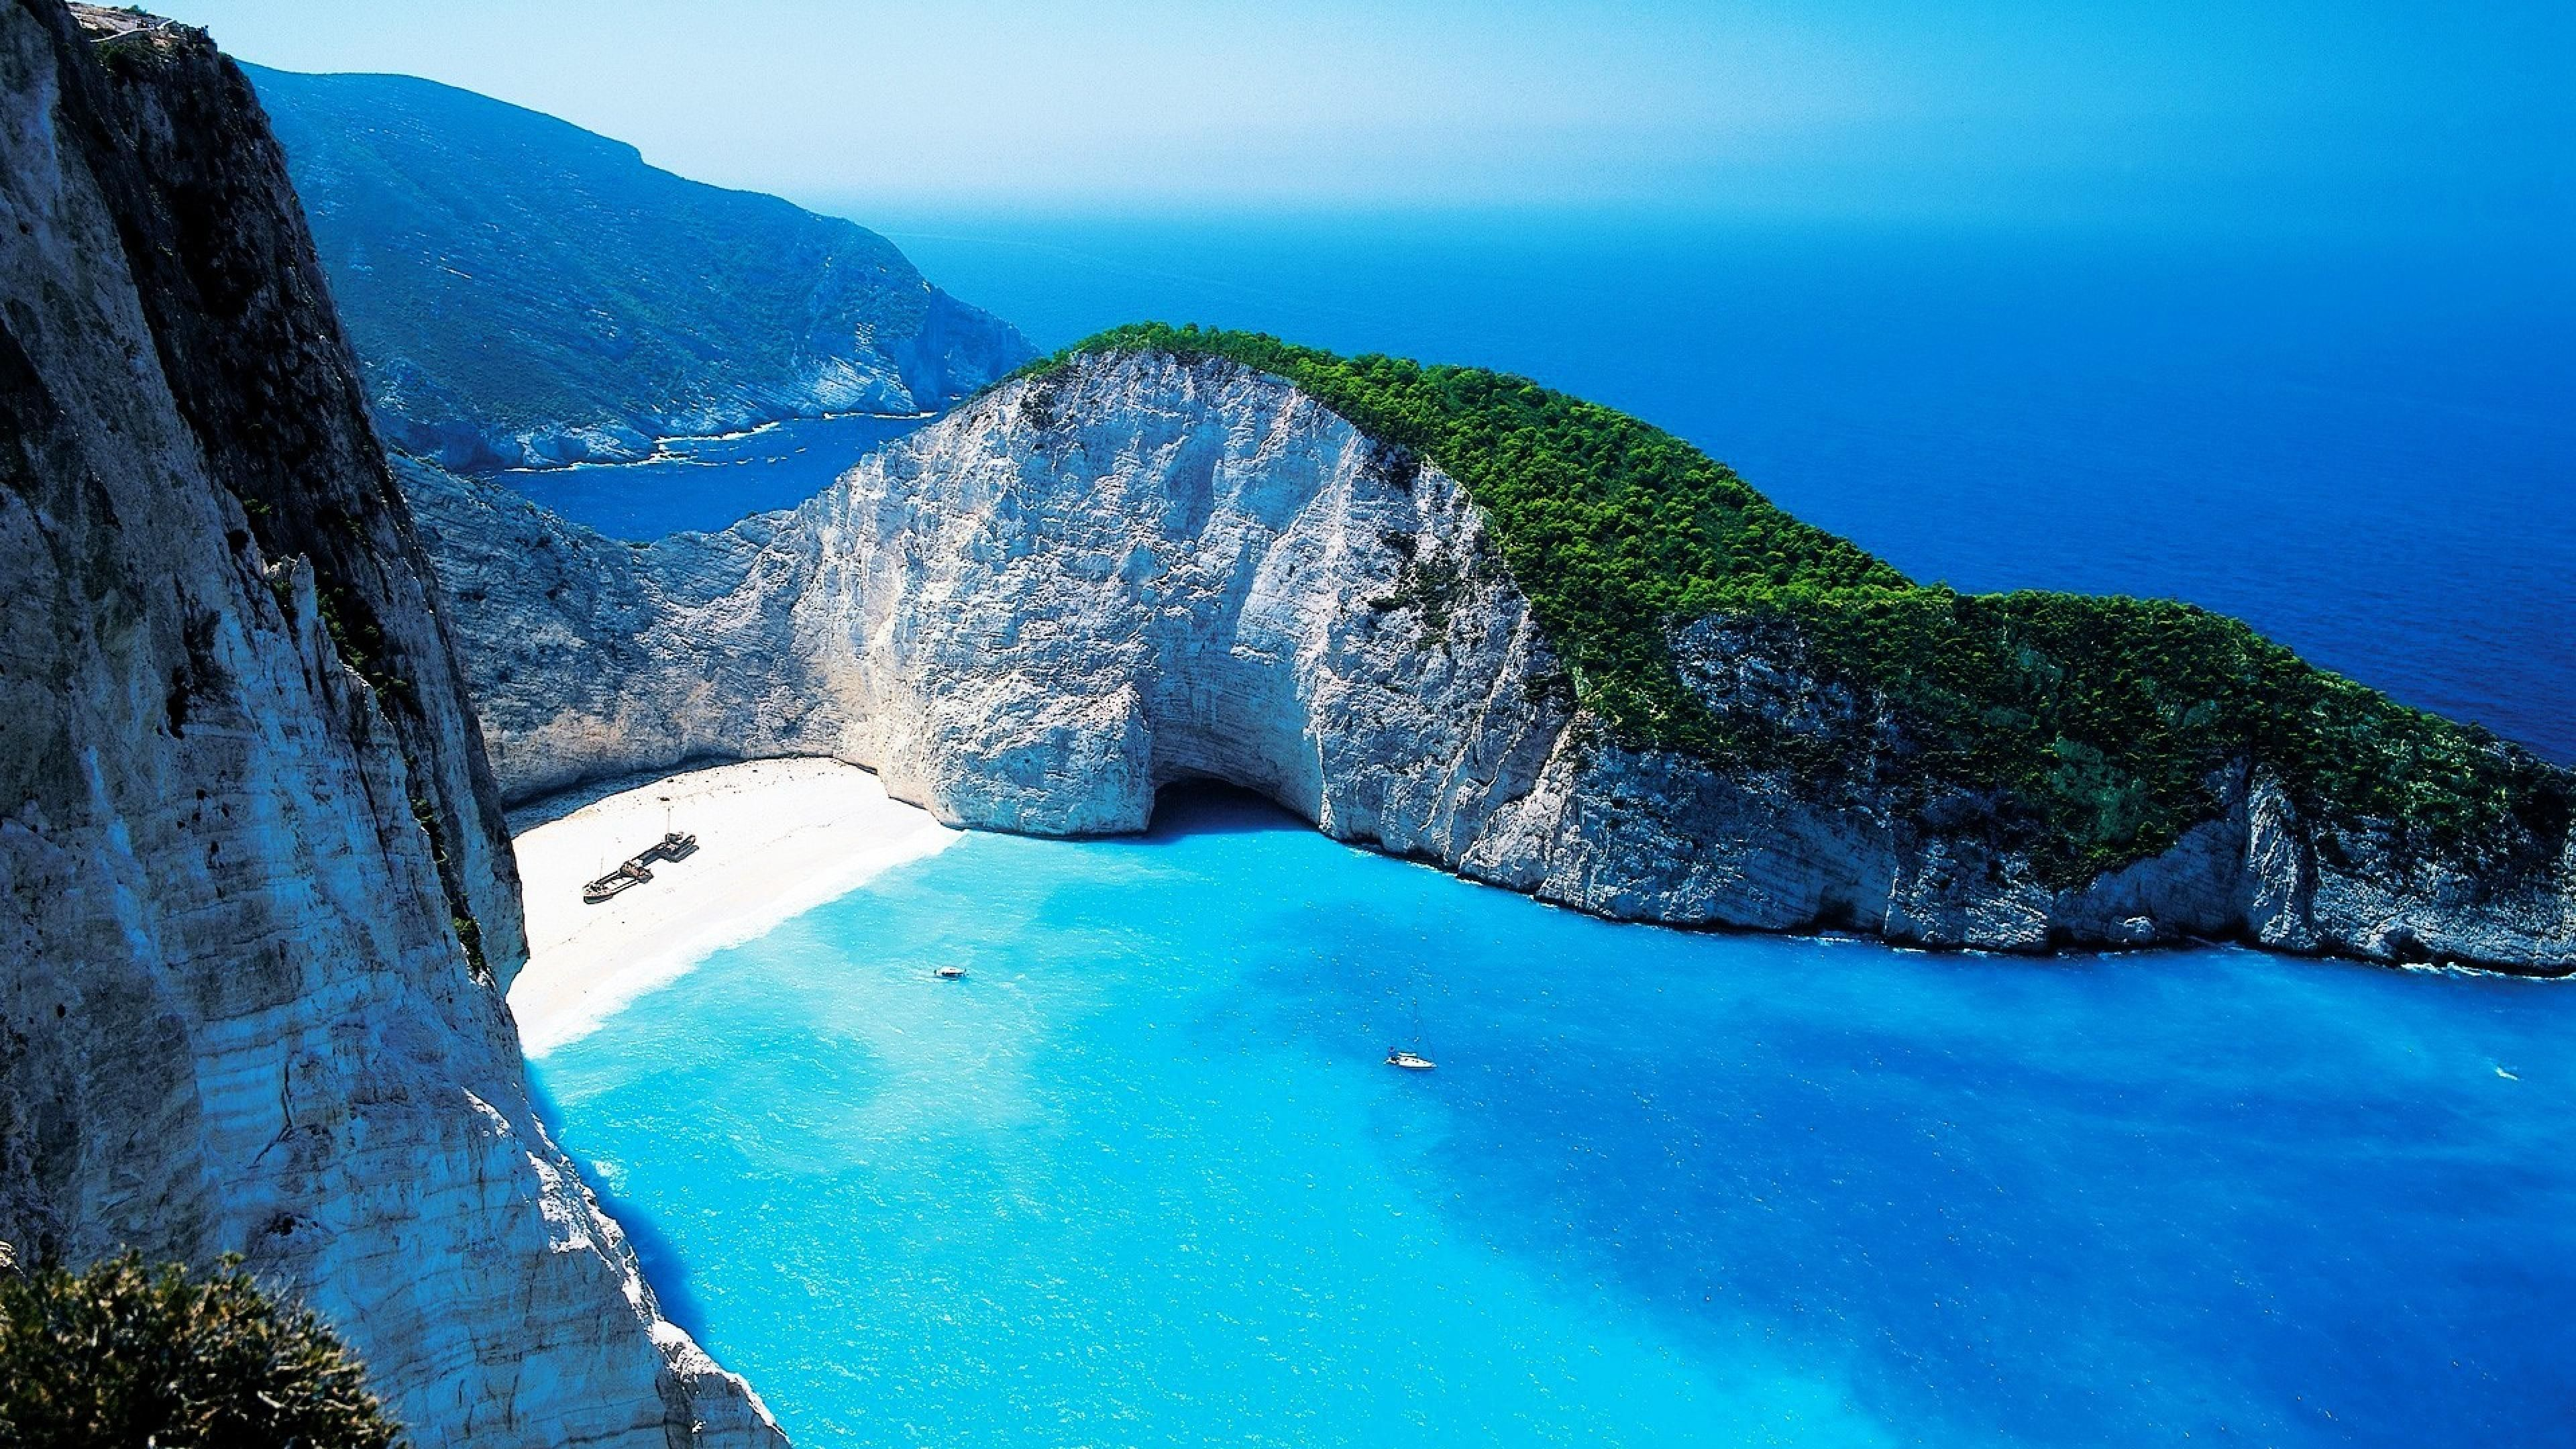 Zakynthos Beach Landscape Nature Wallpaper Images HD 3840x2160